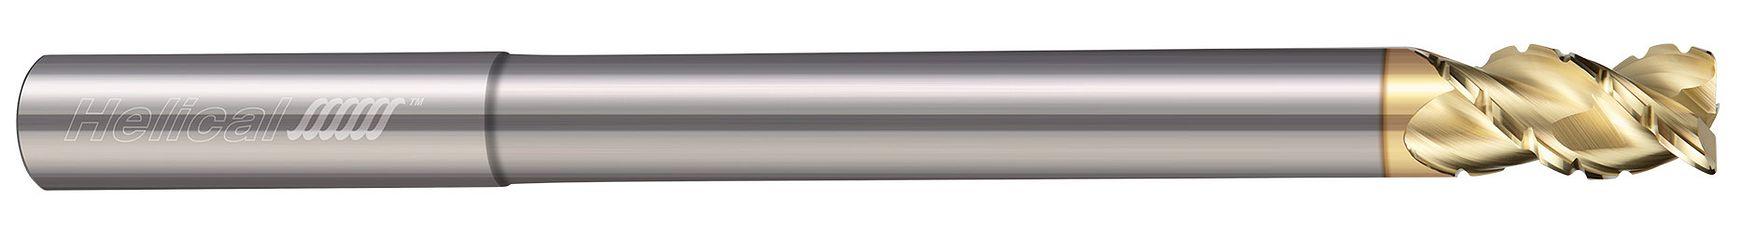 tool-details-28327